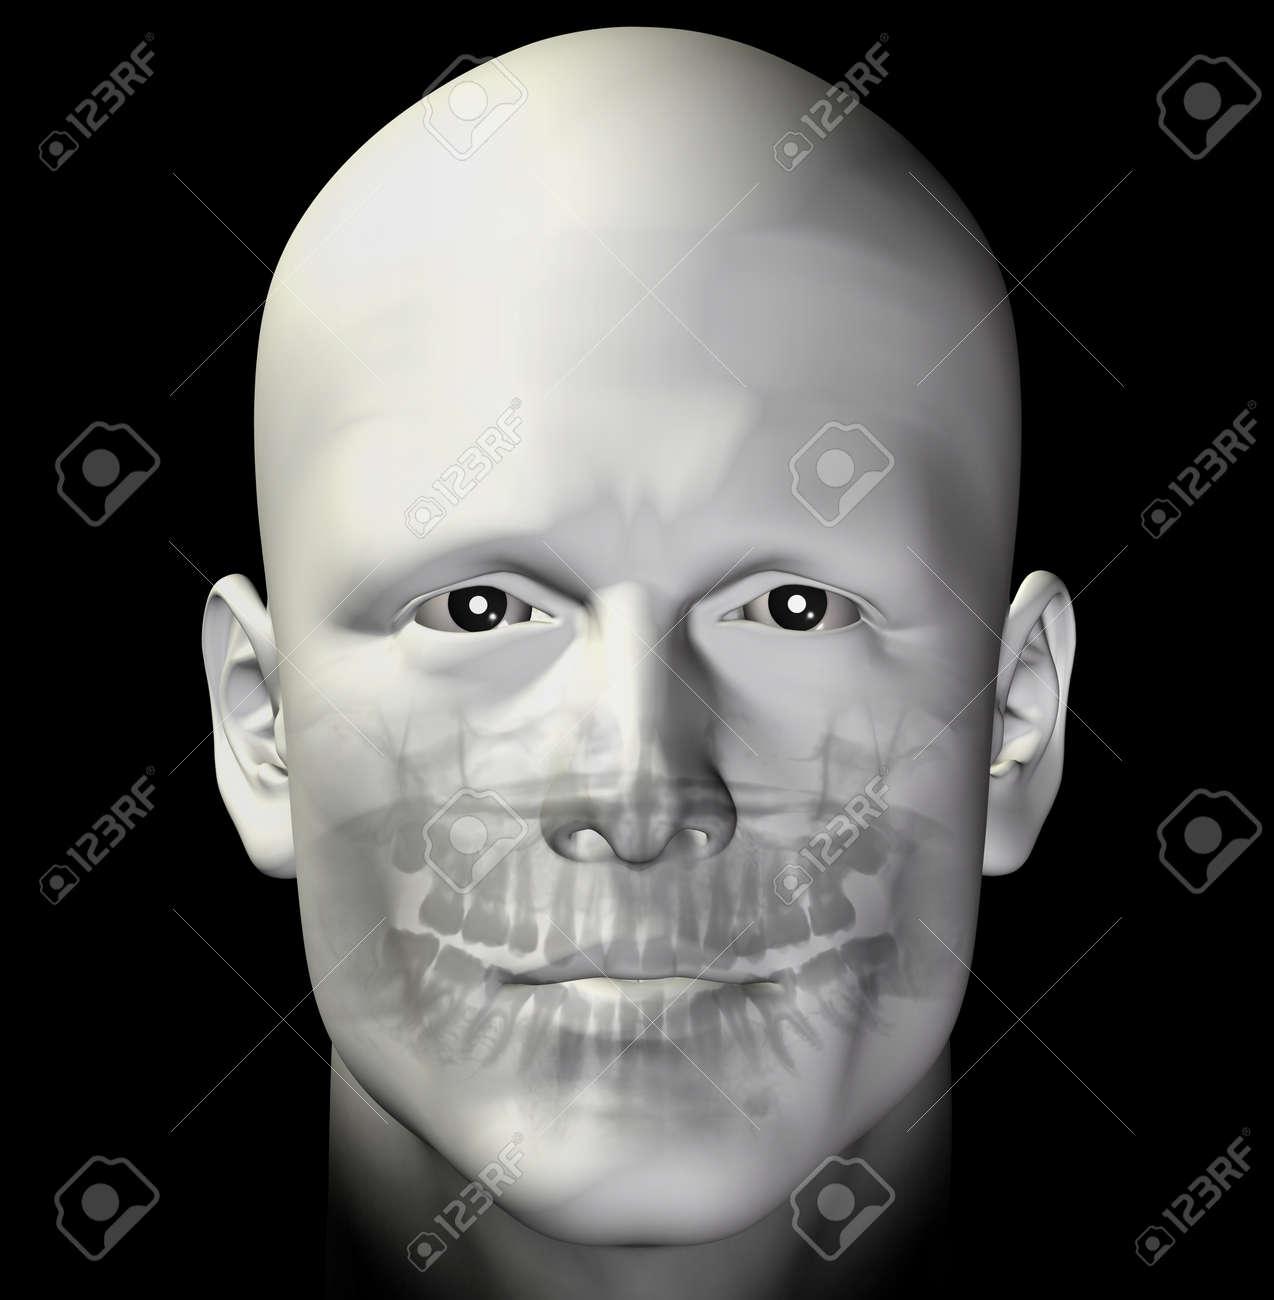 Adult man dental scan x-ray. 3d illustration. Stock Illustration - 9217058